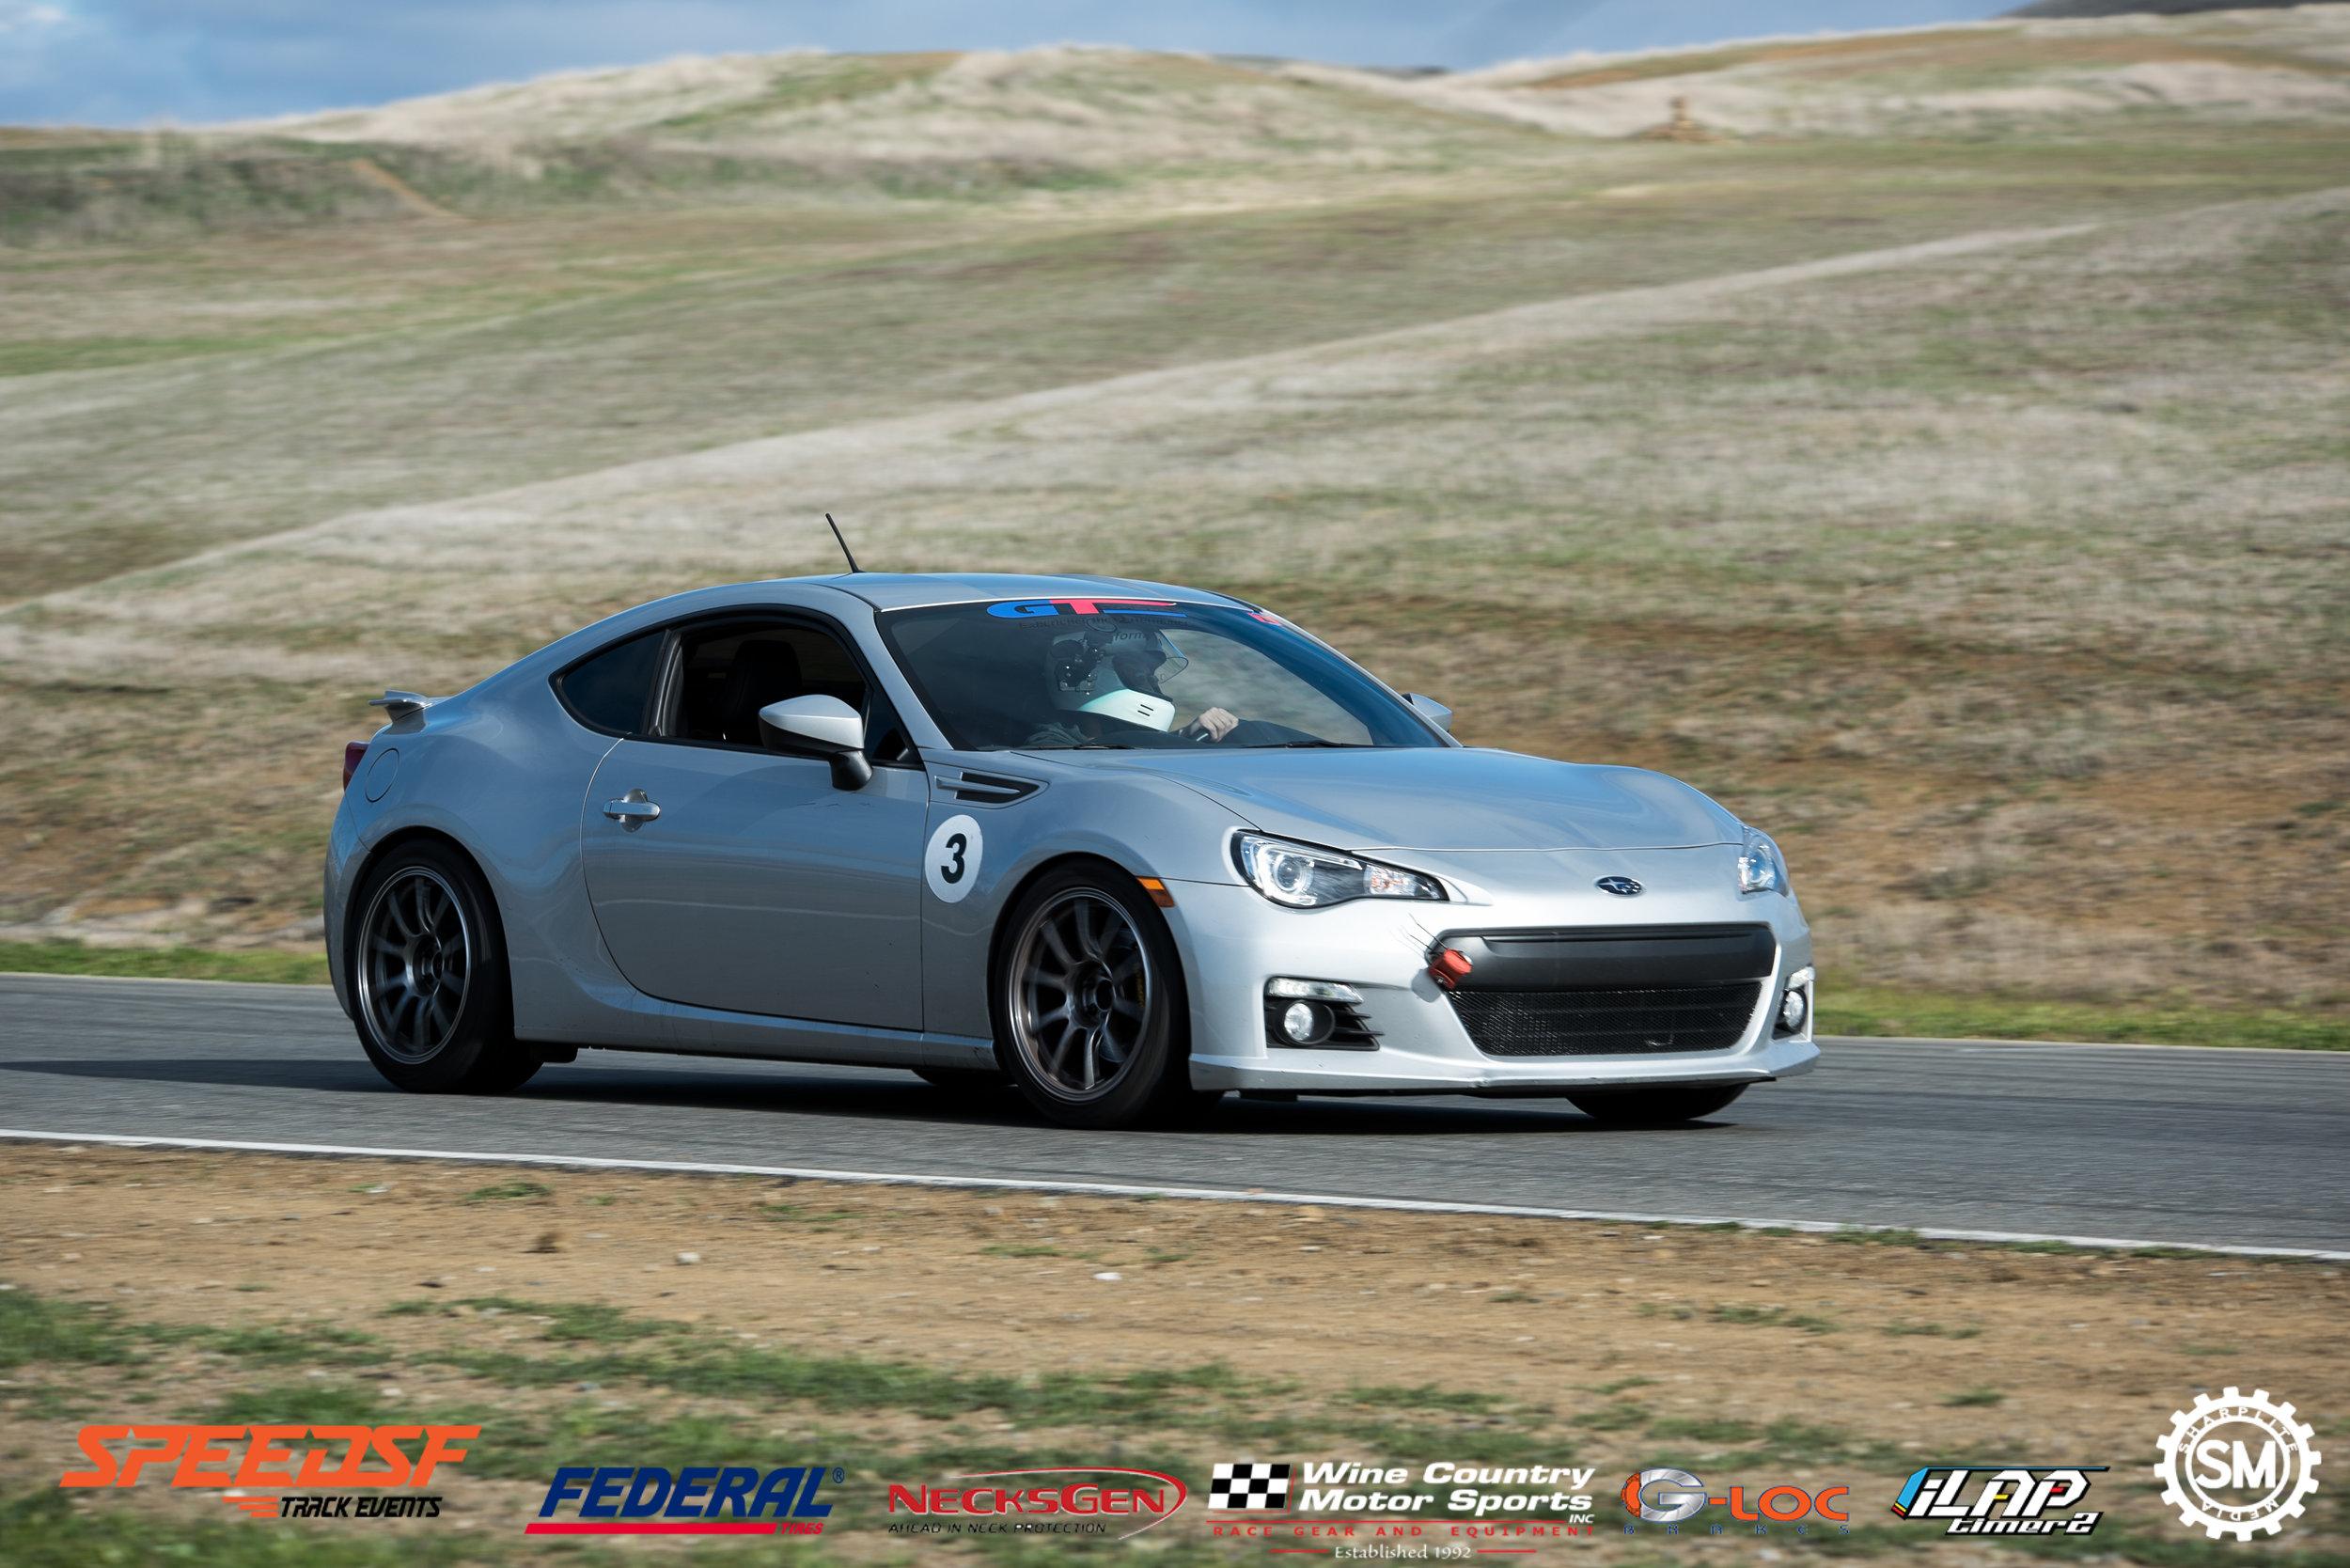 SpeedSF Track Saturday 03-17-18-445.jpg